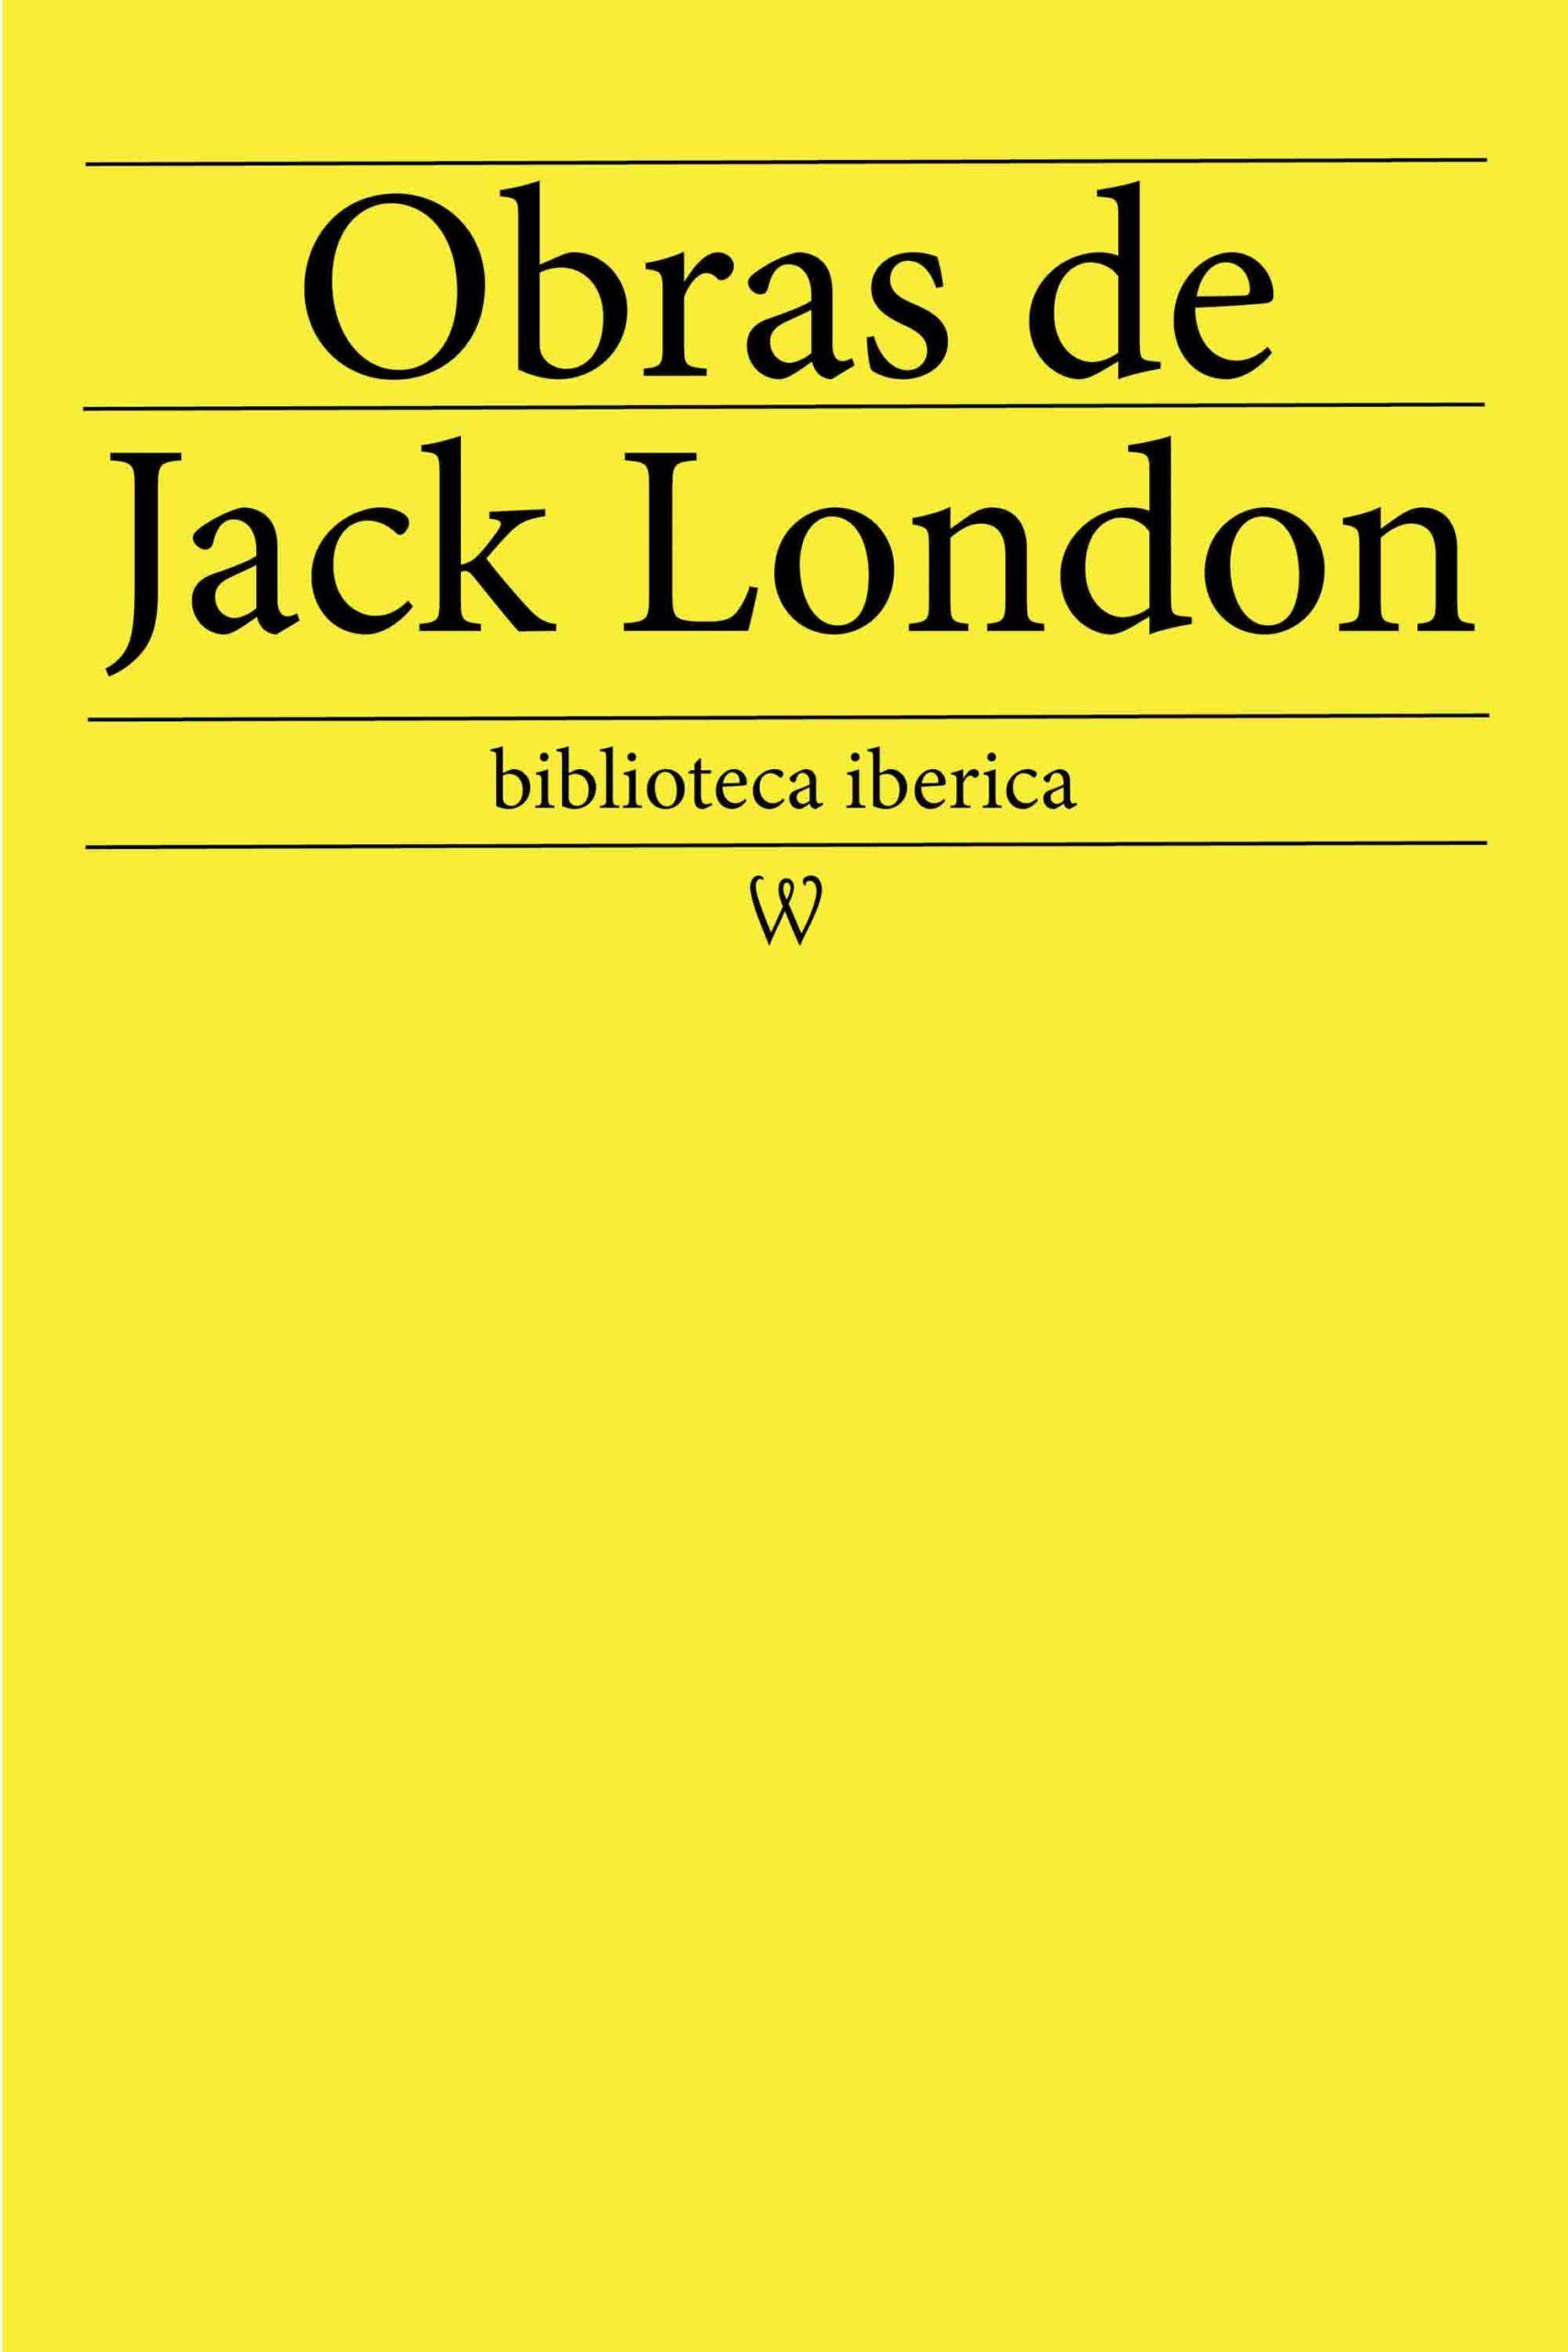 Obras de Jack London